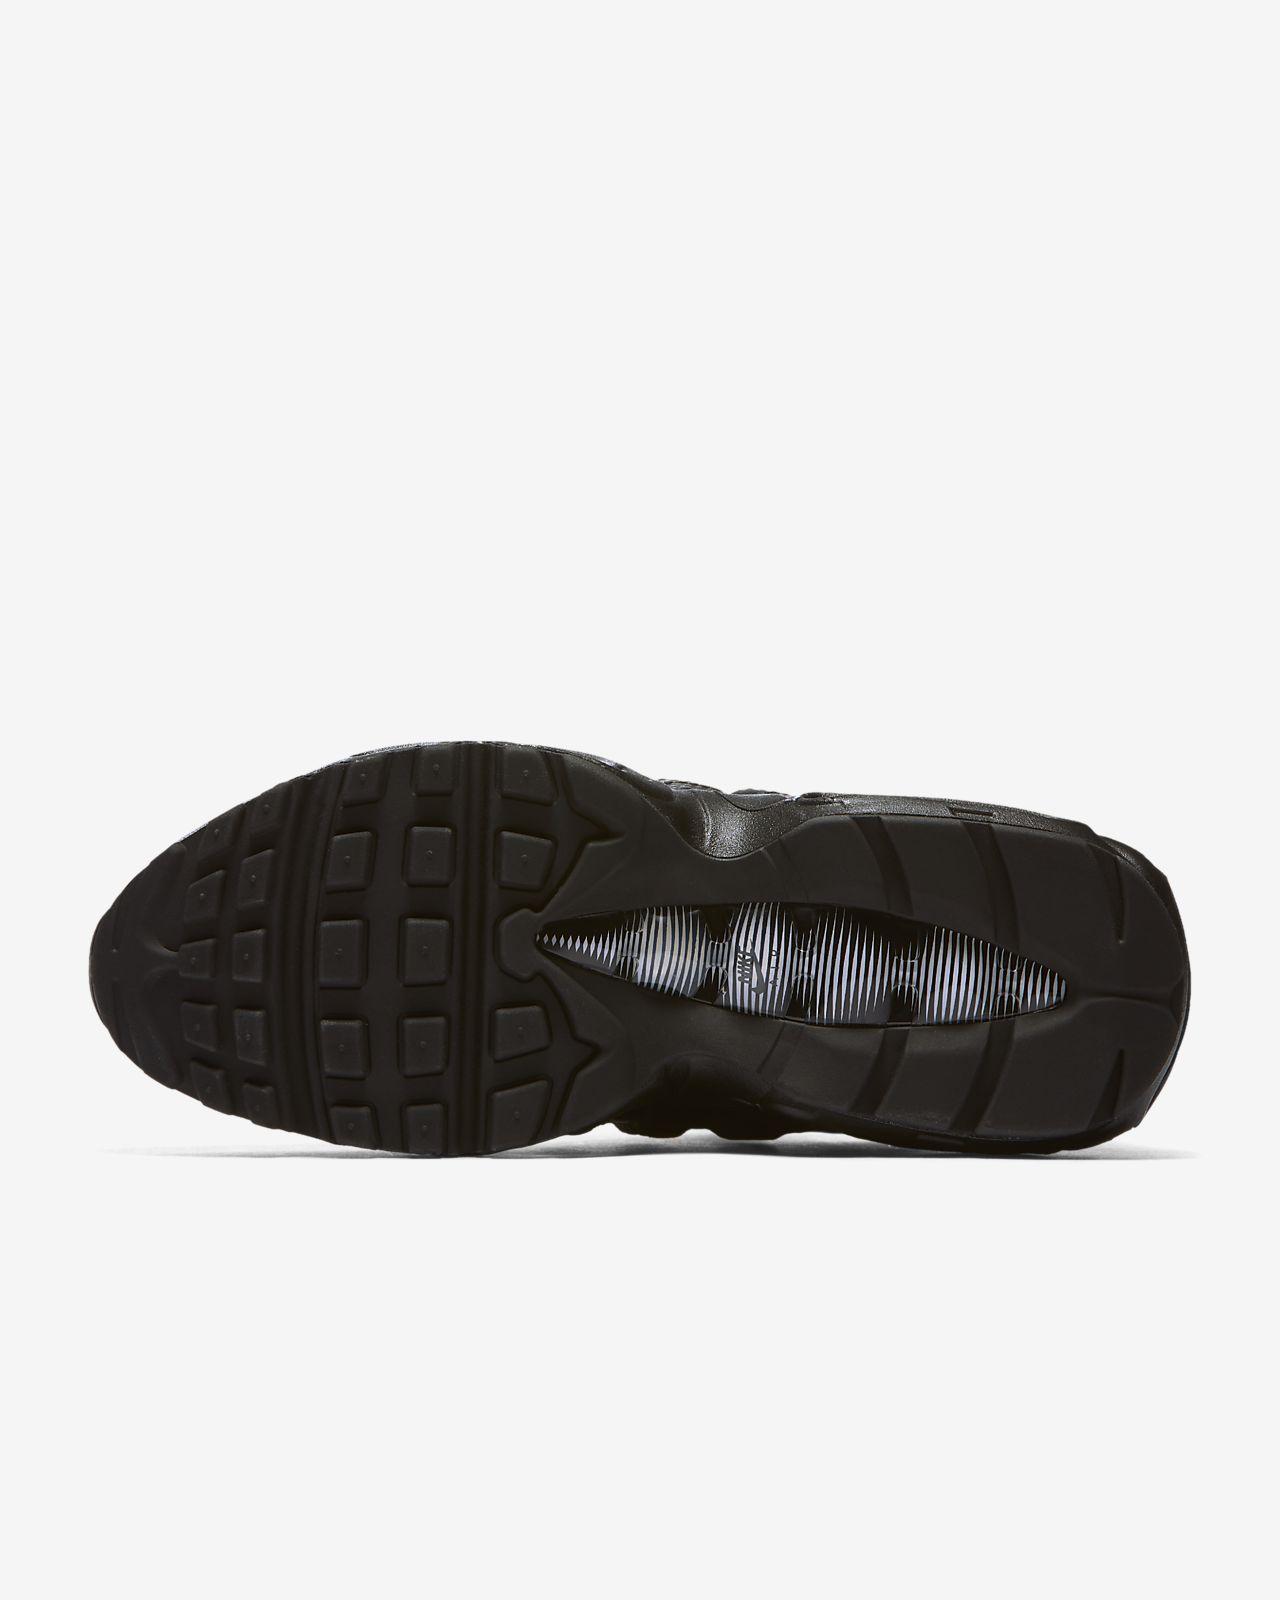 64c8899ef21a Nike Air Max 95 SE Glitter Women s Shoe. Nike.com GB